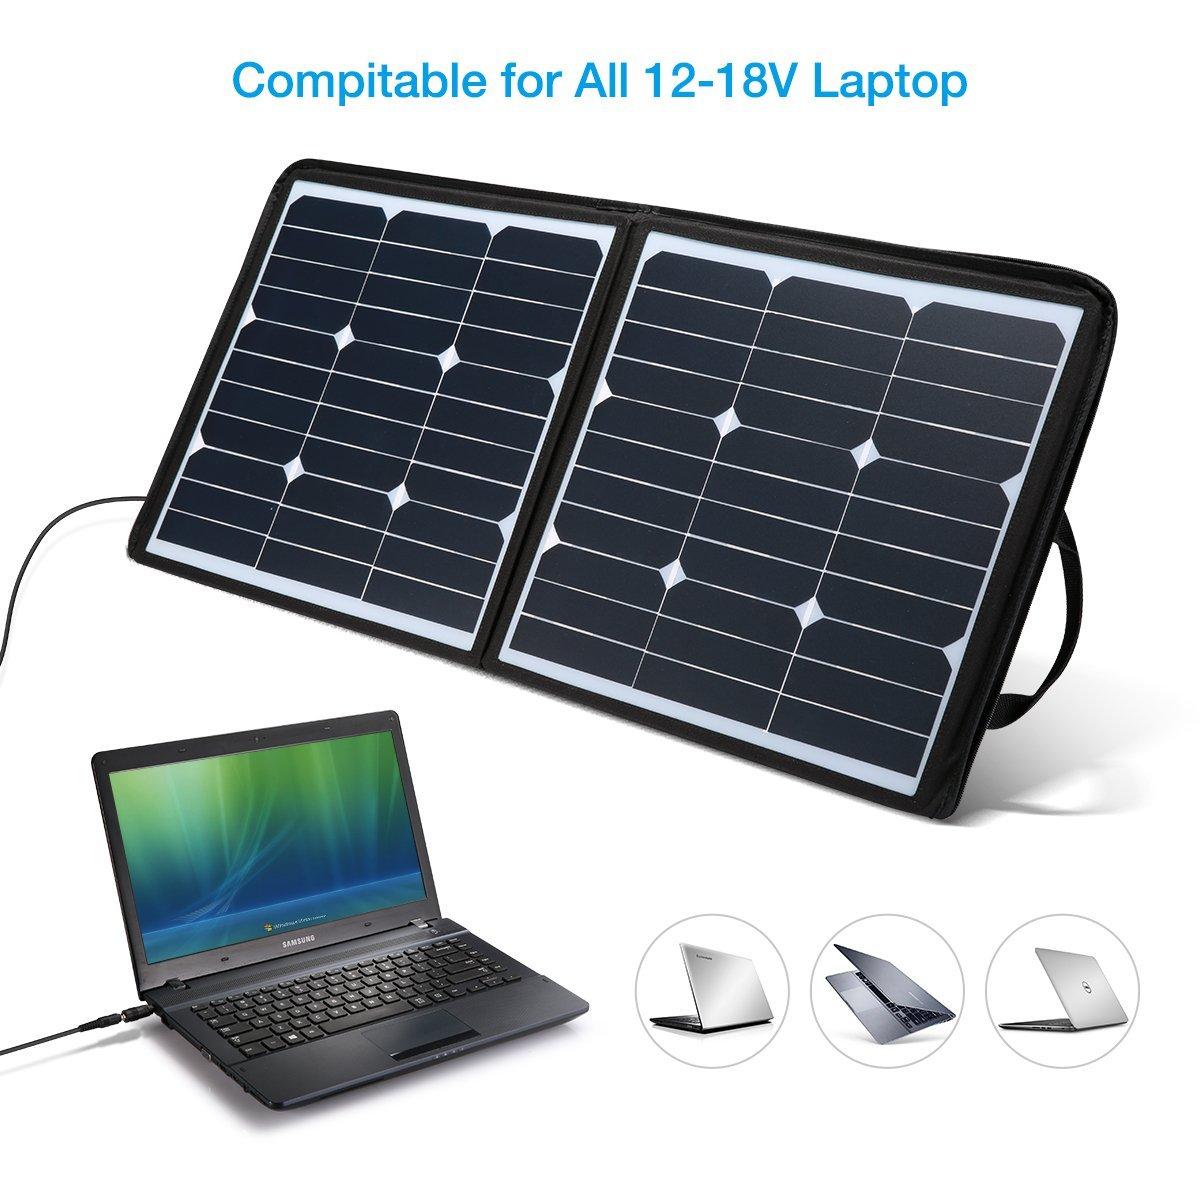 50 Watt 18 Volt Powerful Solar Panels High Performance CE FCC Certified